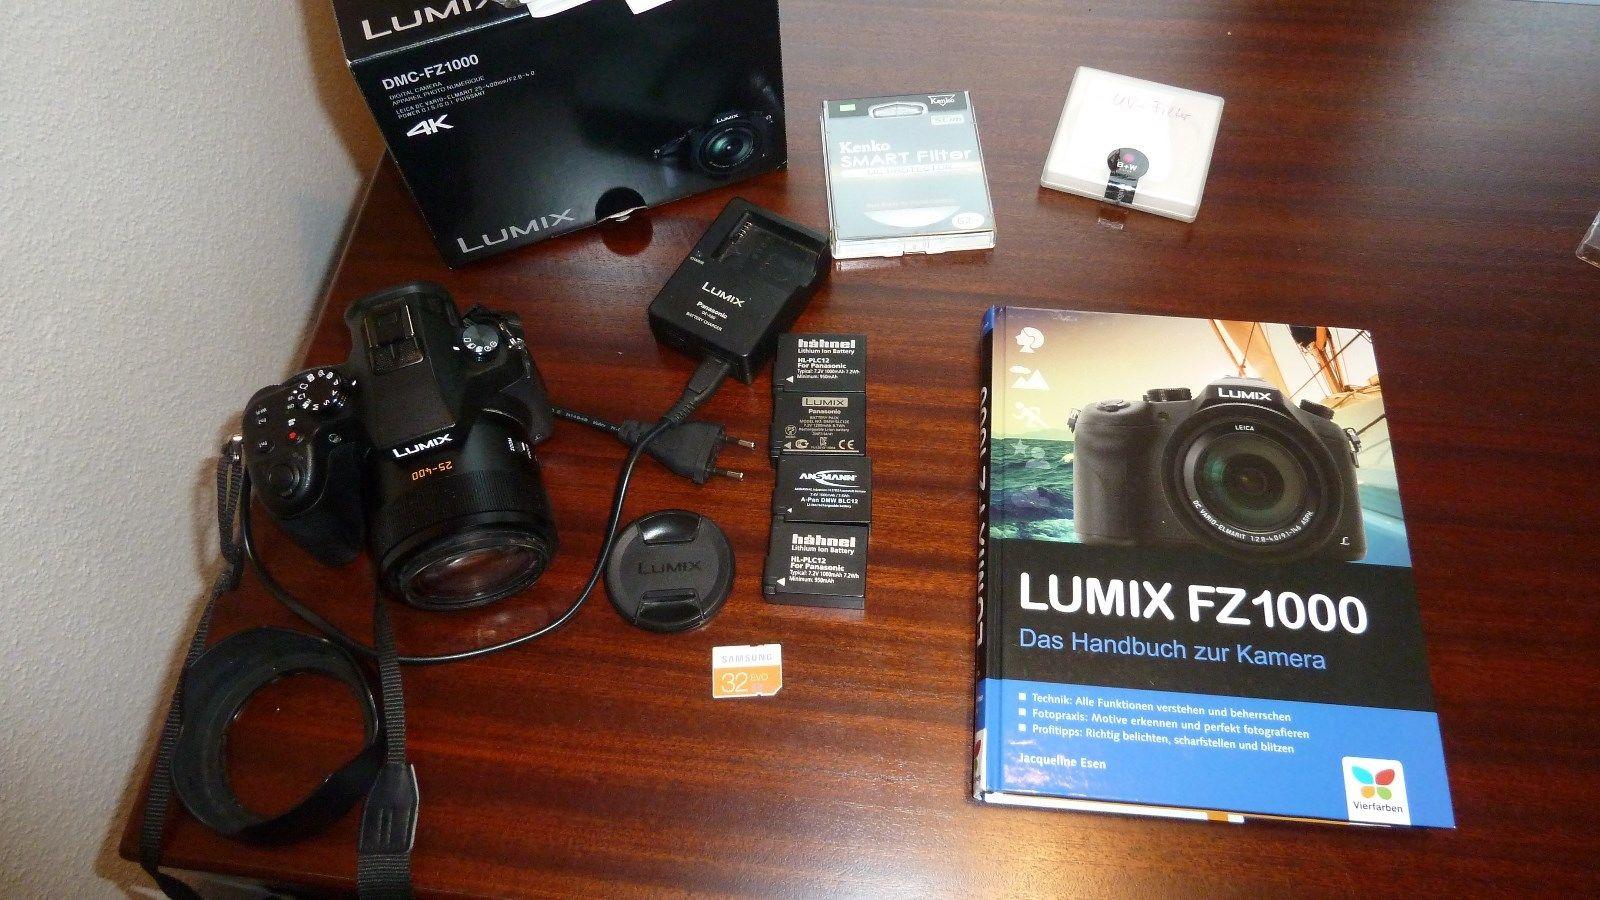 Panasonic LUMIX DMC-FZ1000 20.1 MP Digitalkamera  - geprüft ohne Fehler